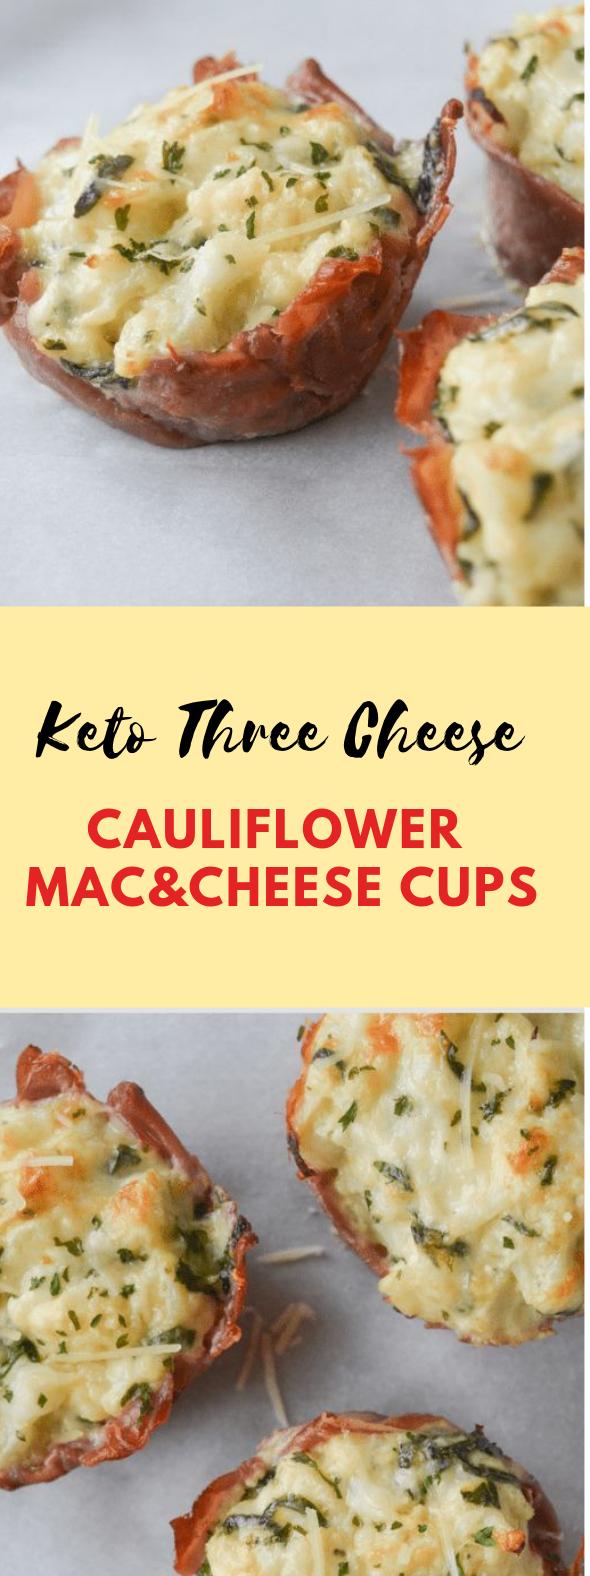 KETO THREE CHEESE CAULIFLOWER MAC AND CHEESE CUPS #delicious #keto